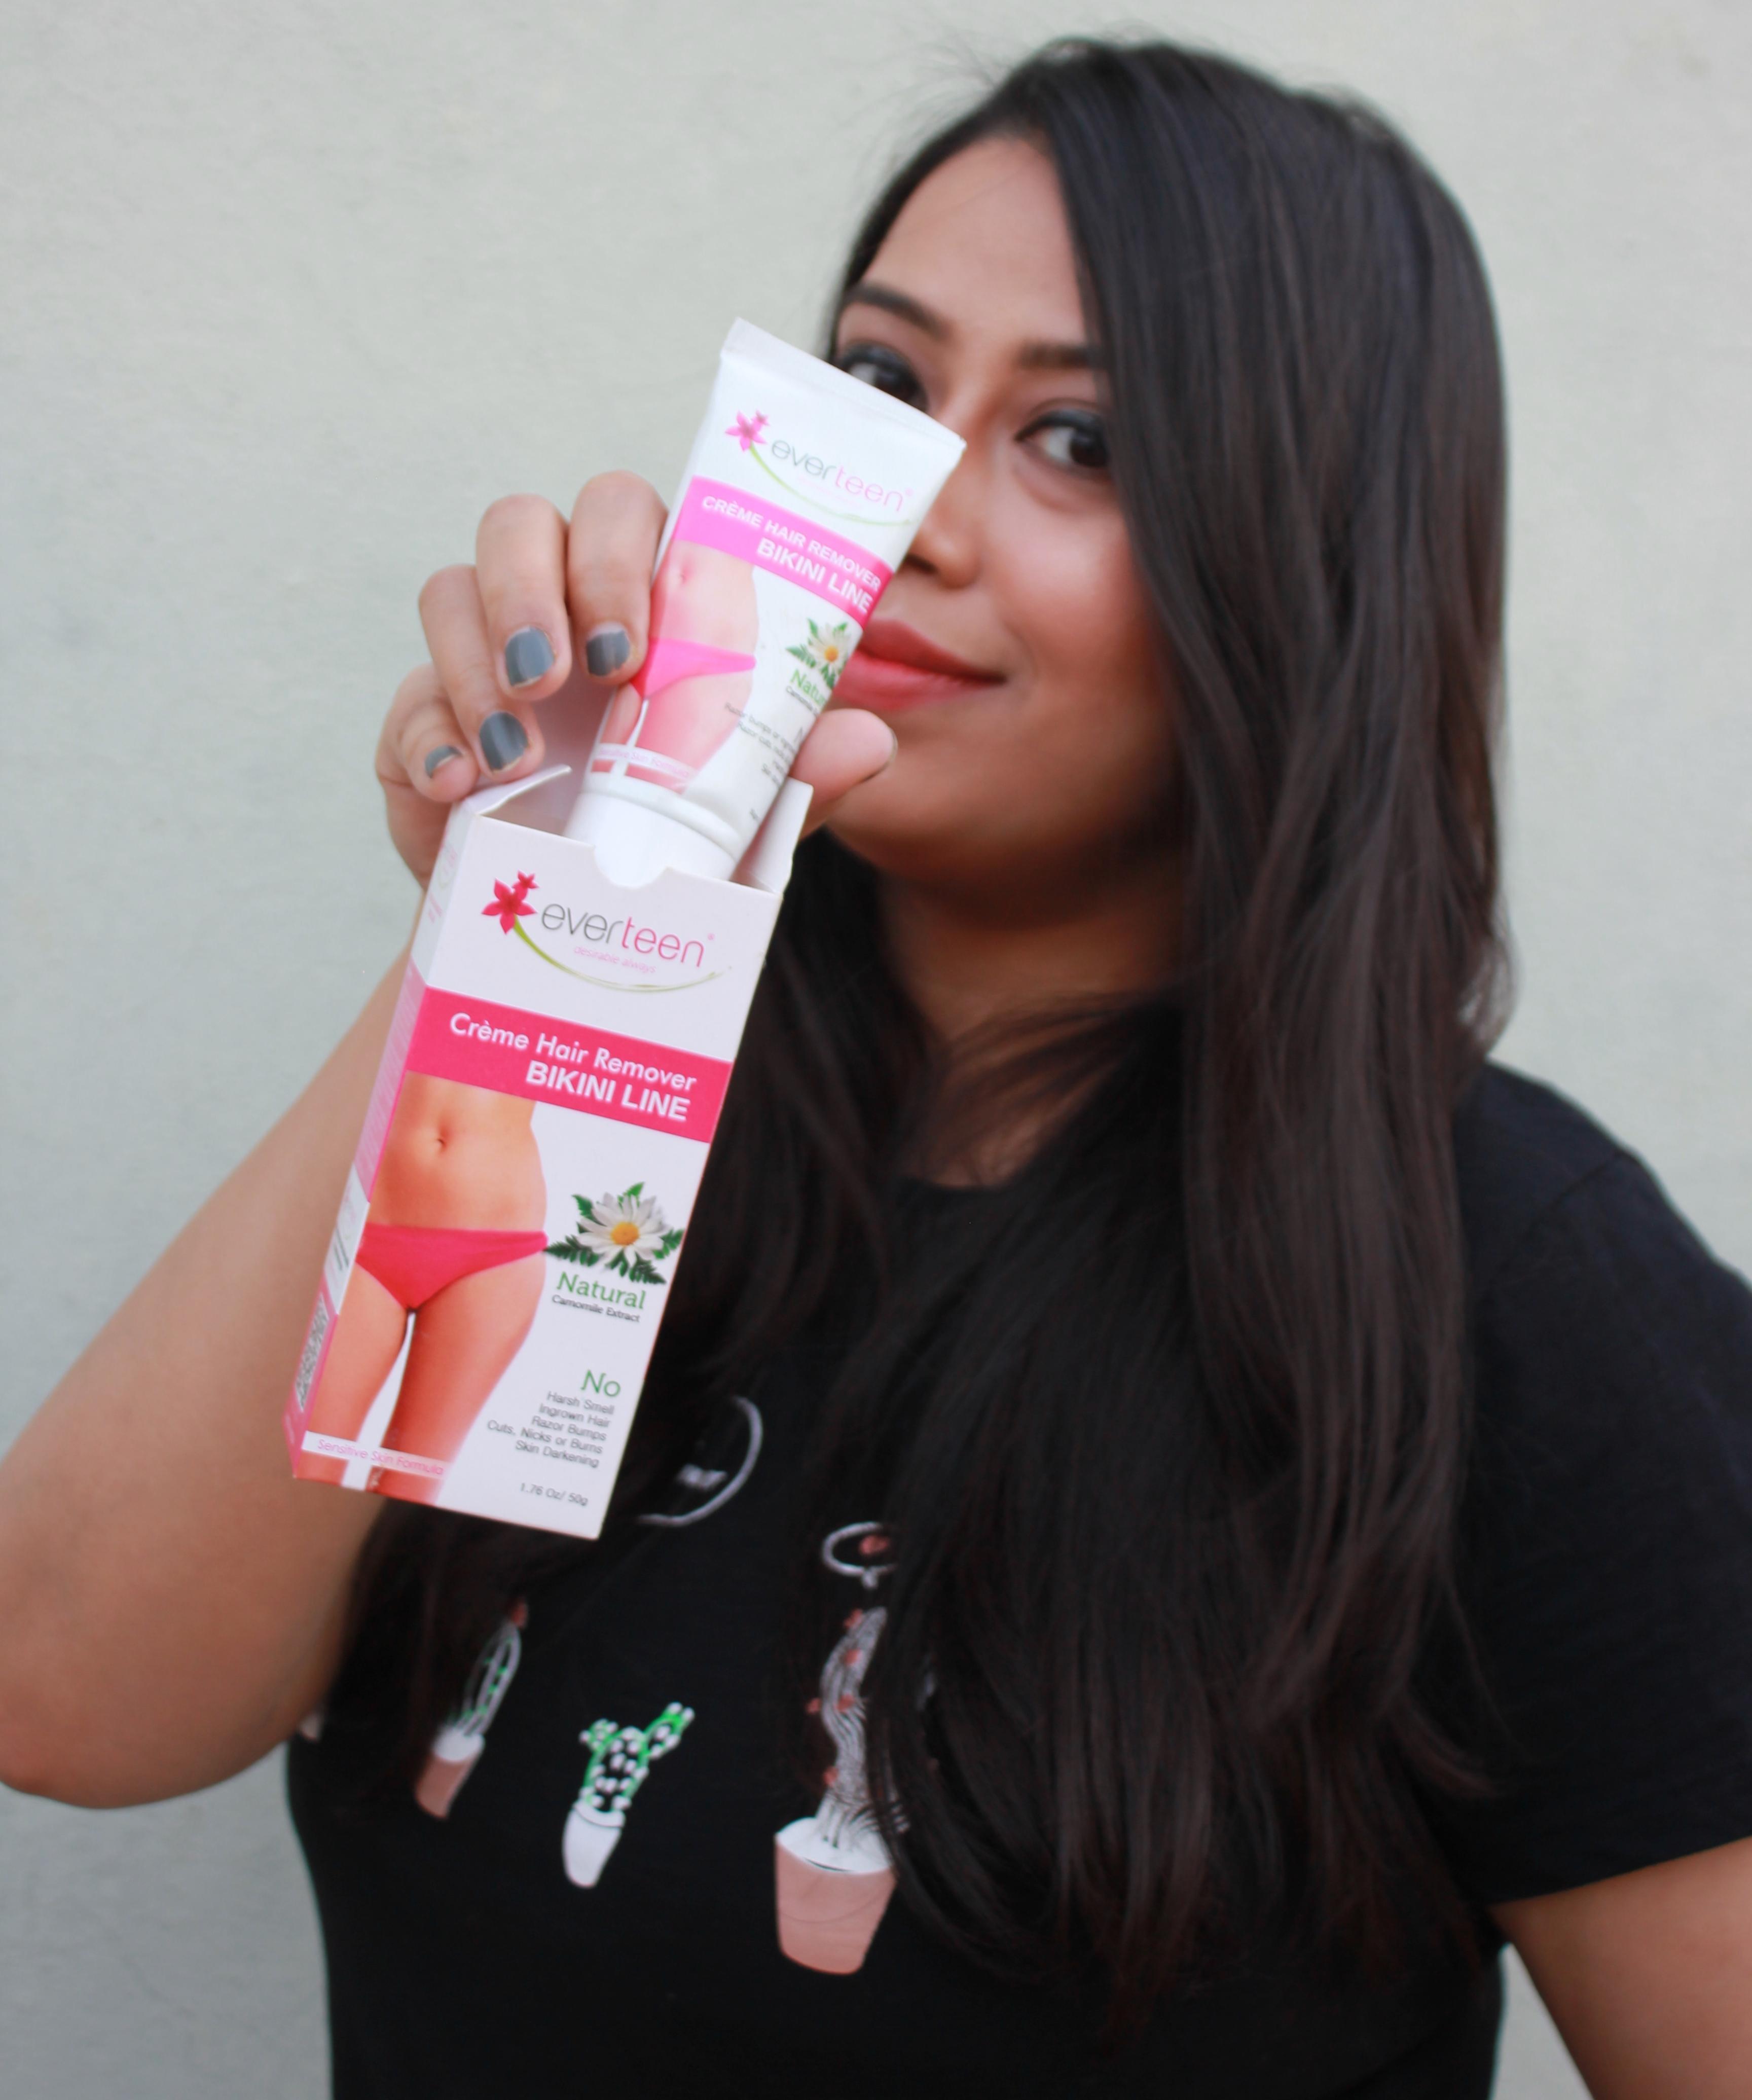 Everteen Bikini Line Hair Removal Cream Review